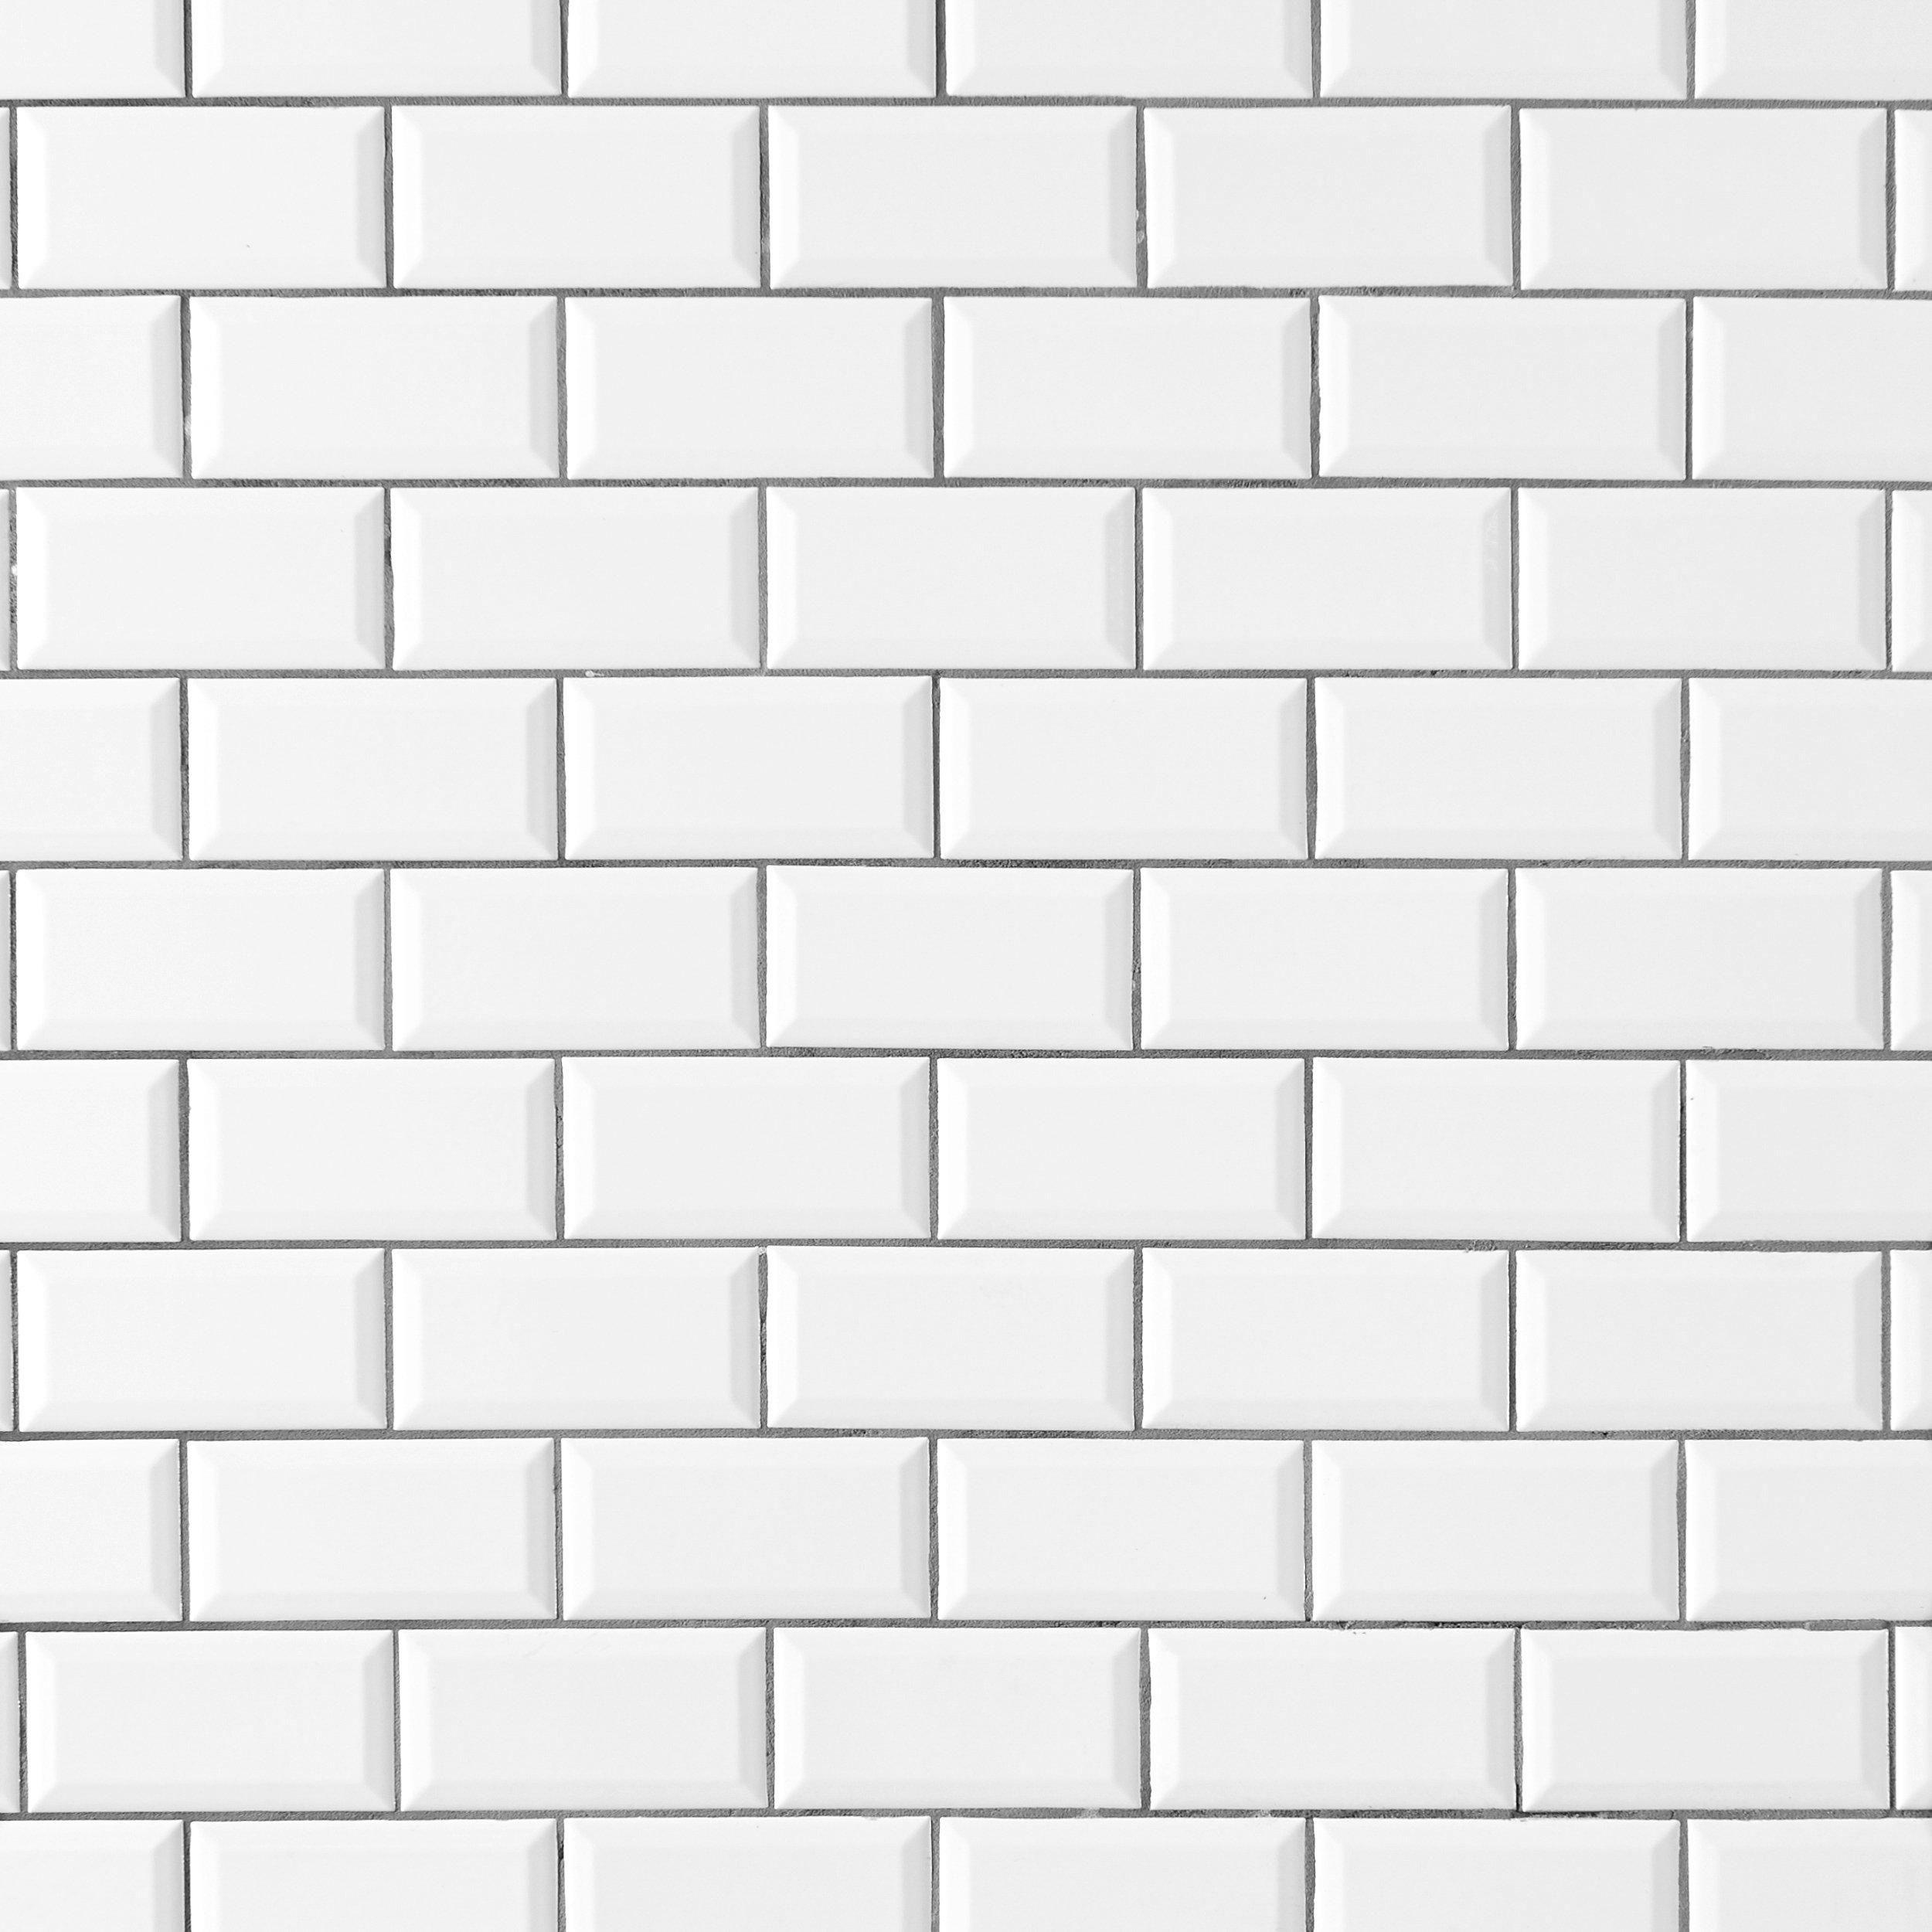 Bright White Ice Beveled Ceramic Wall Tile In 2019